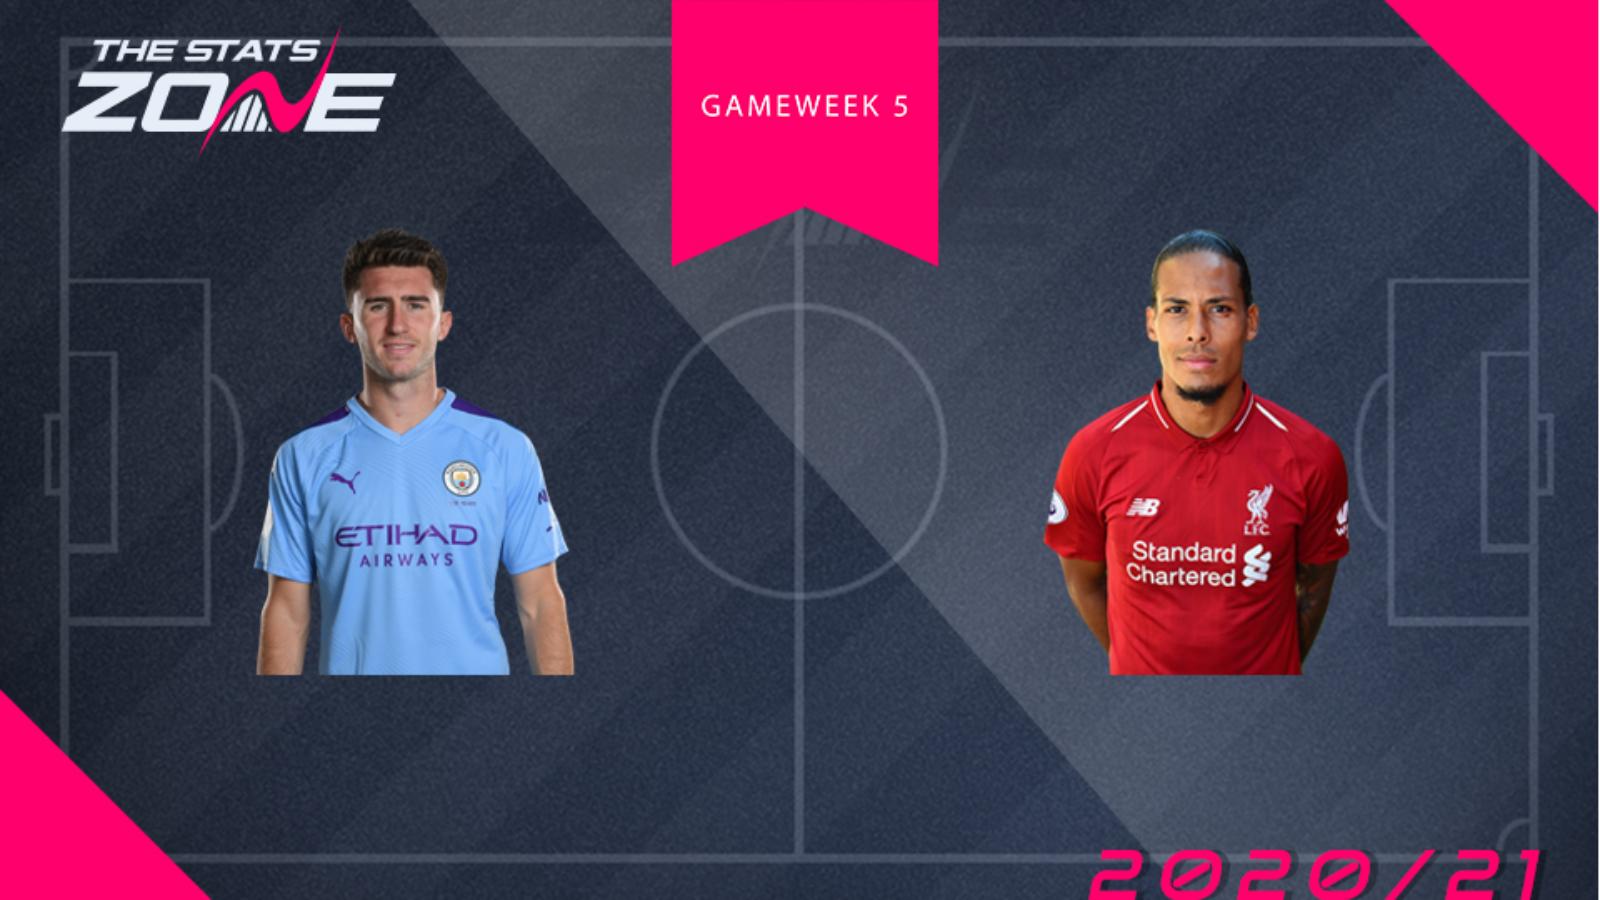 Fpl Gameweek 5 Head To Head Comparisons Aymeric Laporte Vs Virgil Van Dijk The Stats Zone